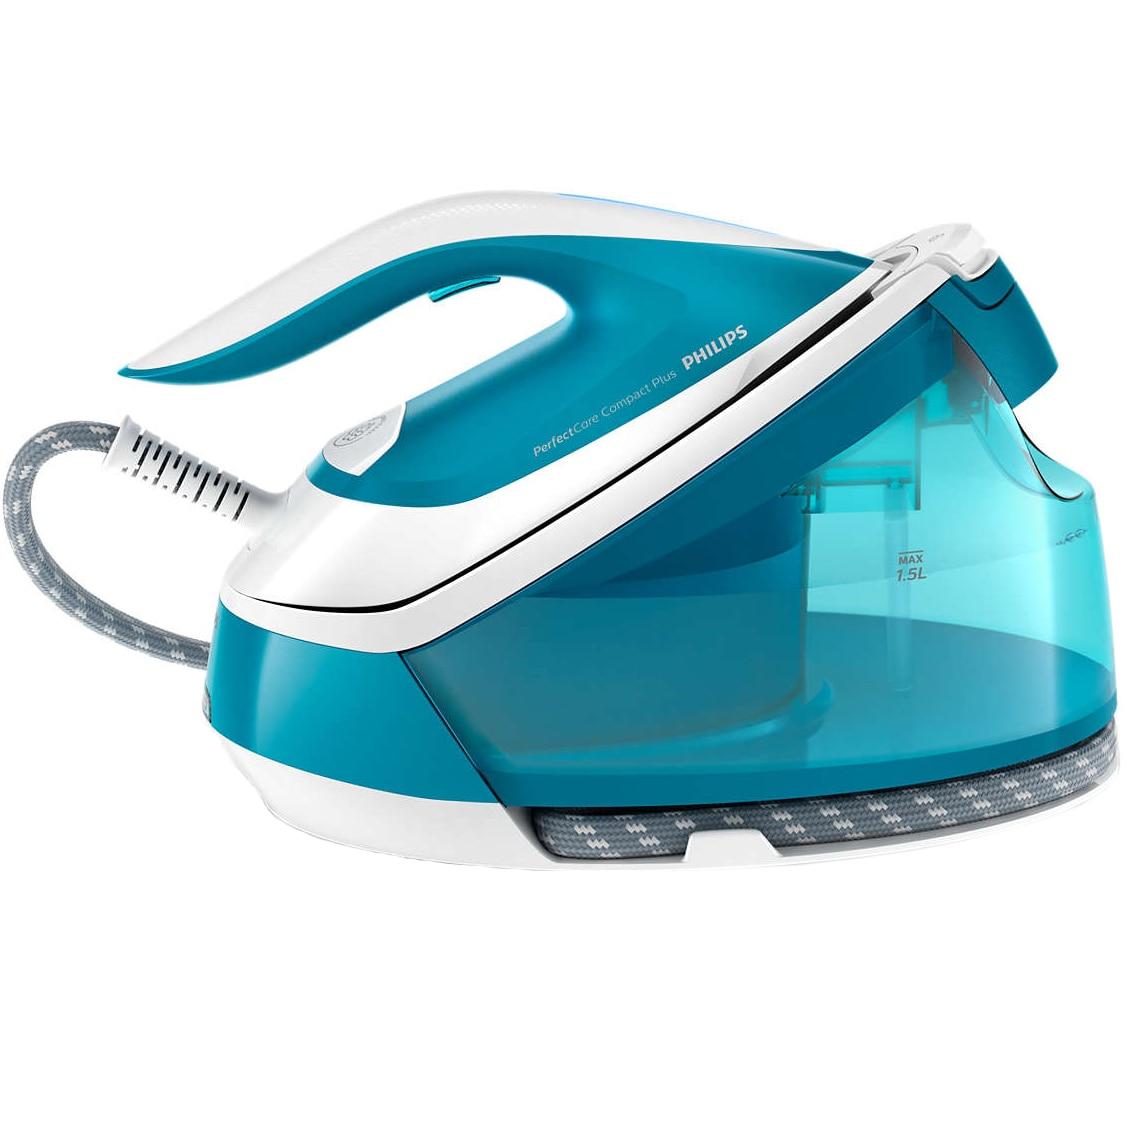 Fotografie Statie de calcat Philips PerfectCare Compact Plus GC7920/20, 2400 W, OptimalTemp, abur 120 g/min, Smart Calc Clean, talpa SteamGlide, 1.5 L, Albastru